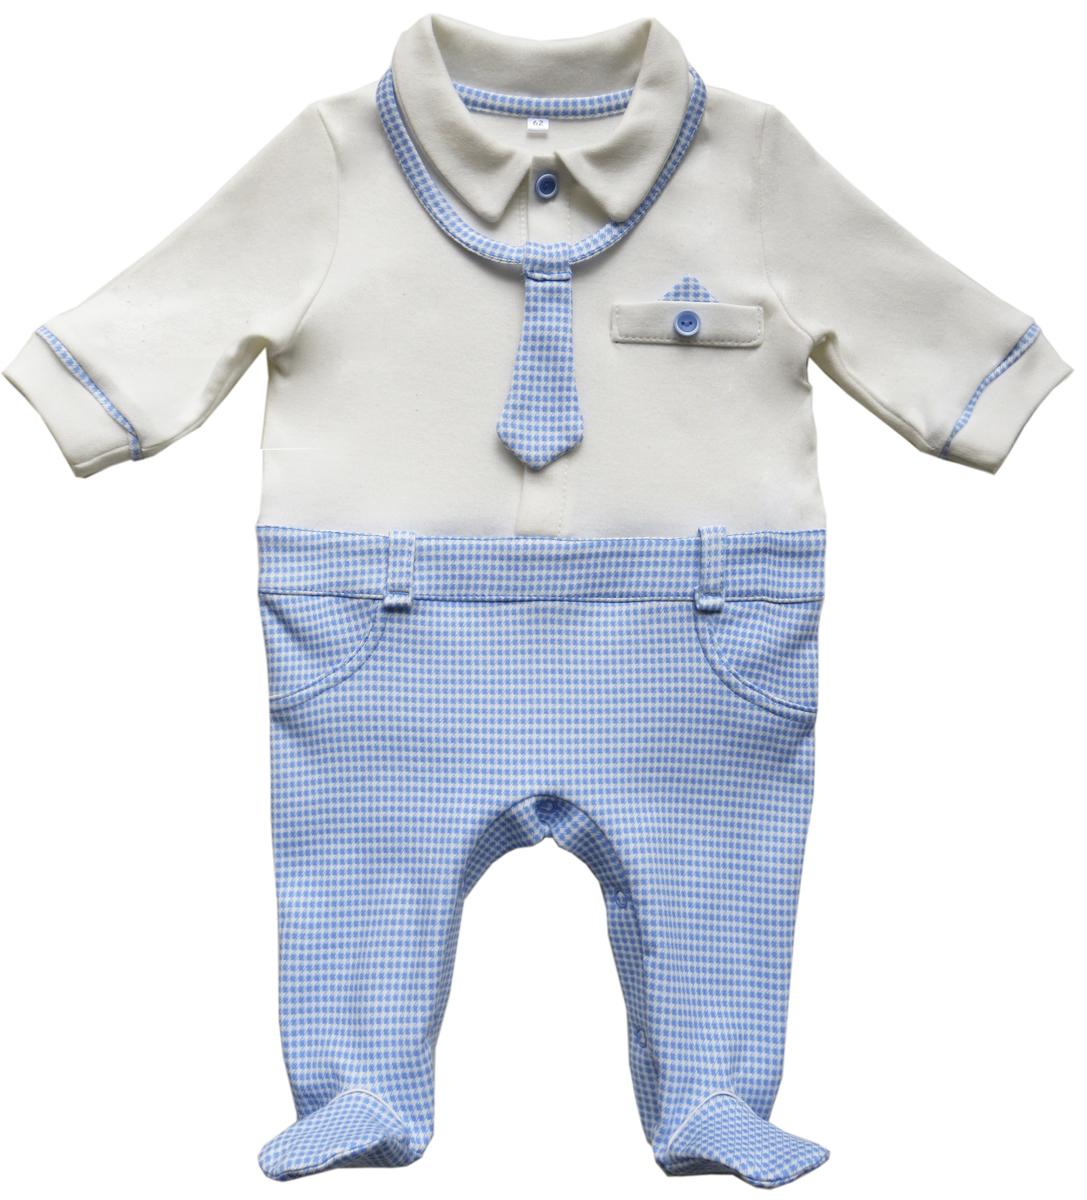 Комбинезон домашний для мальчика Soni Kids Мишка джентельмен, цвет: белый, голубой. З6102014. Размер 74 soni kids кофточка